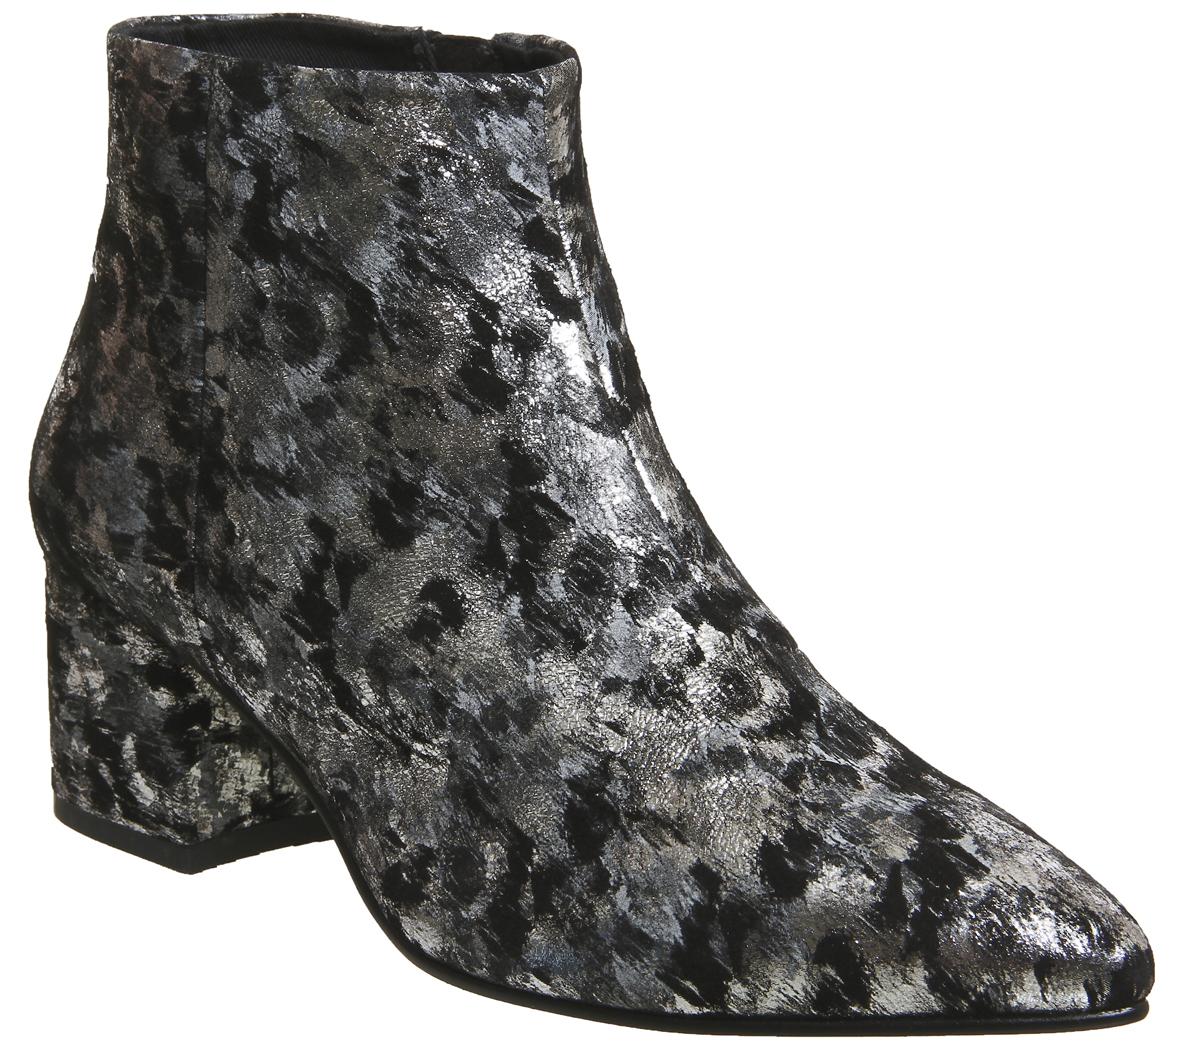 74254459c9 Womens-Vagabond-Mya-Boots-Black-Silver-Boots thumbnail 3